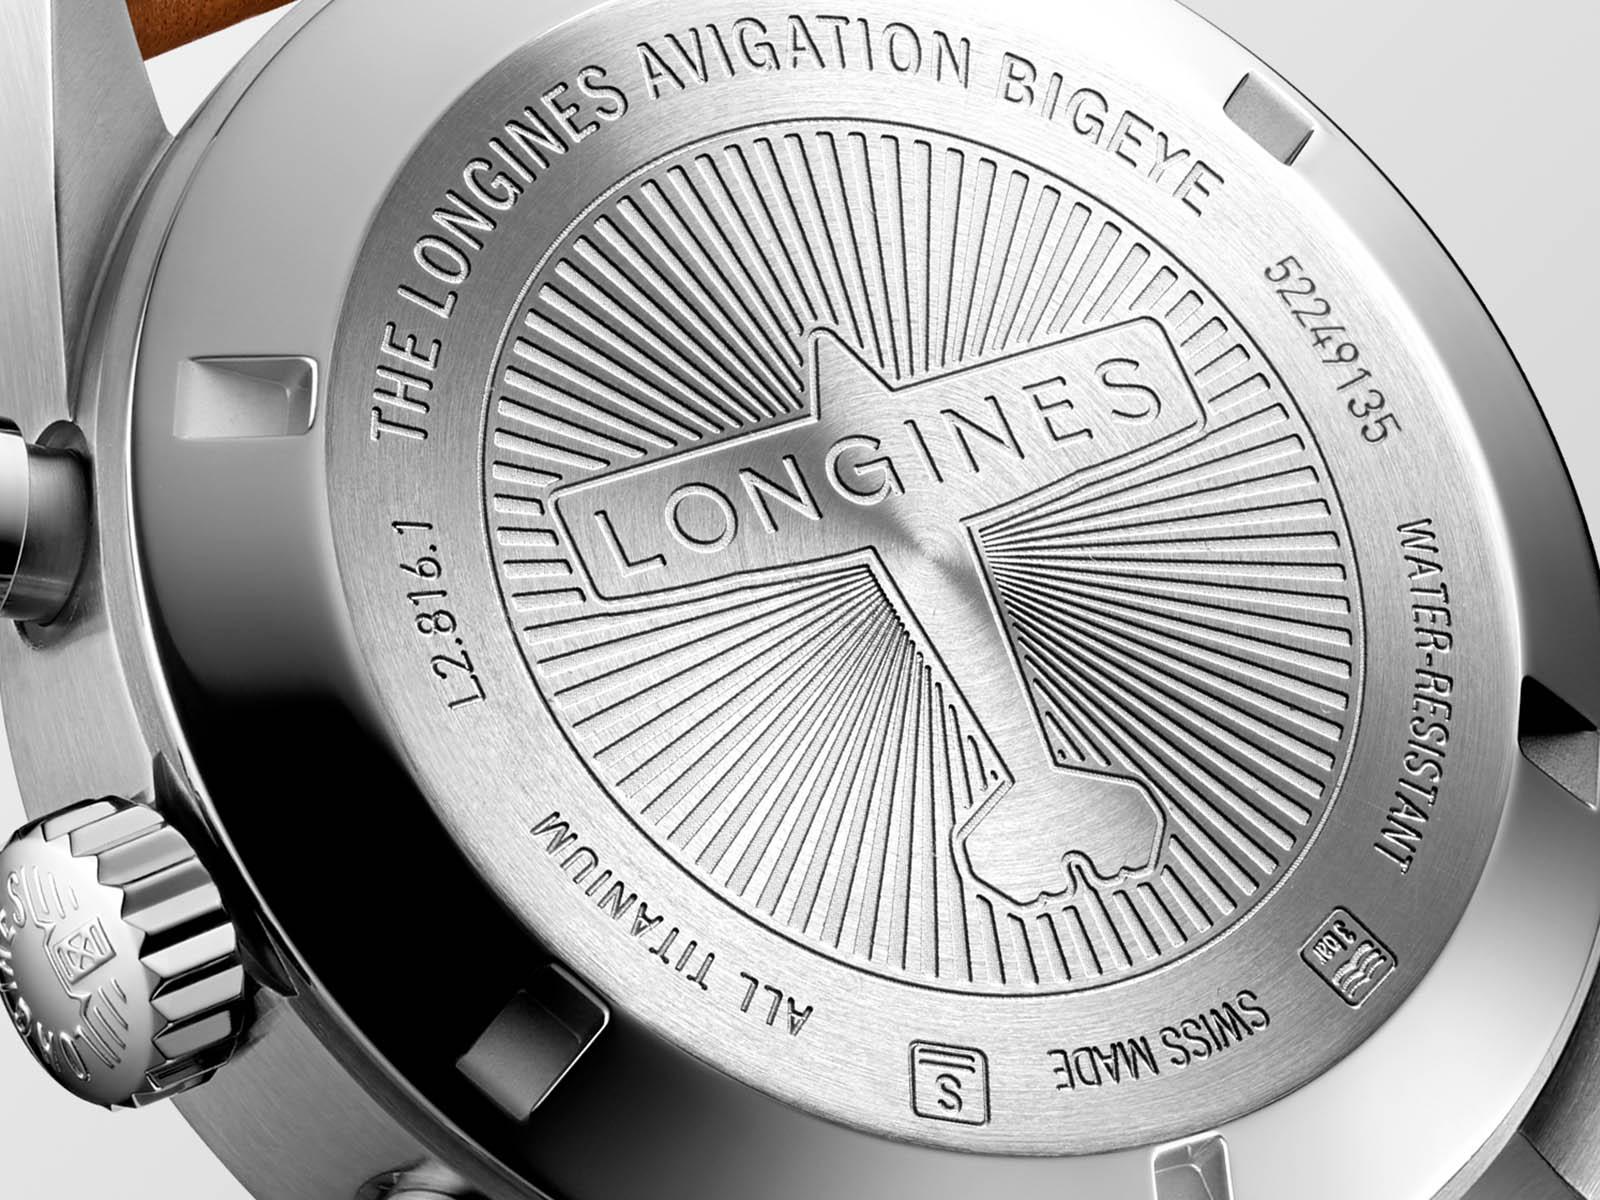 l2-816-1-93-2-longines-avigation-bigeye-titanium-5.jpg